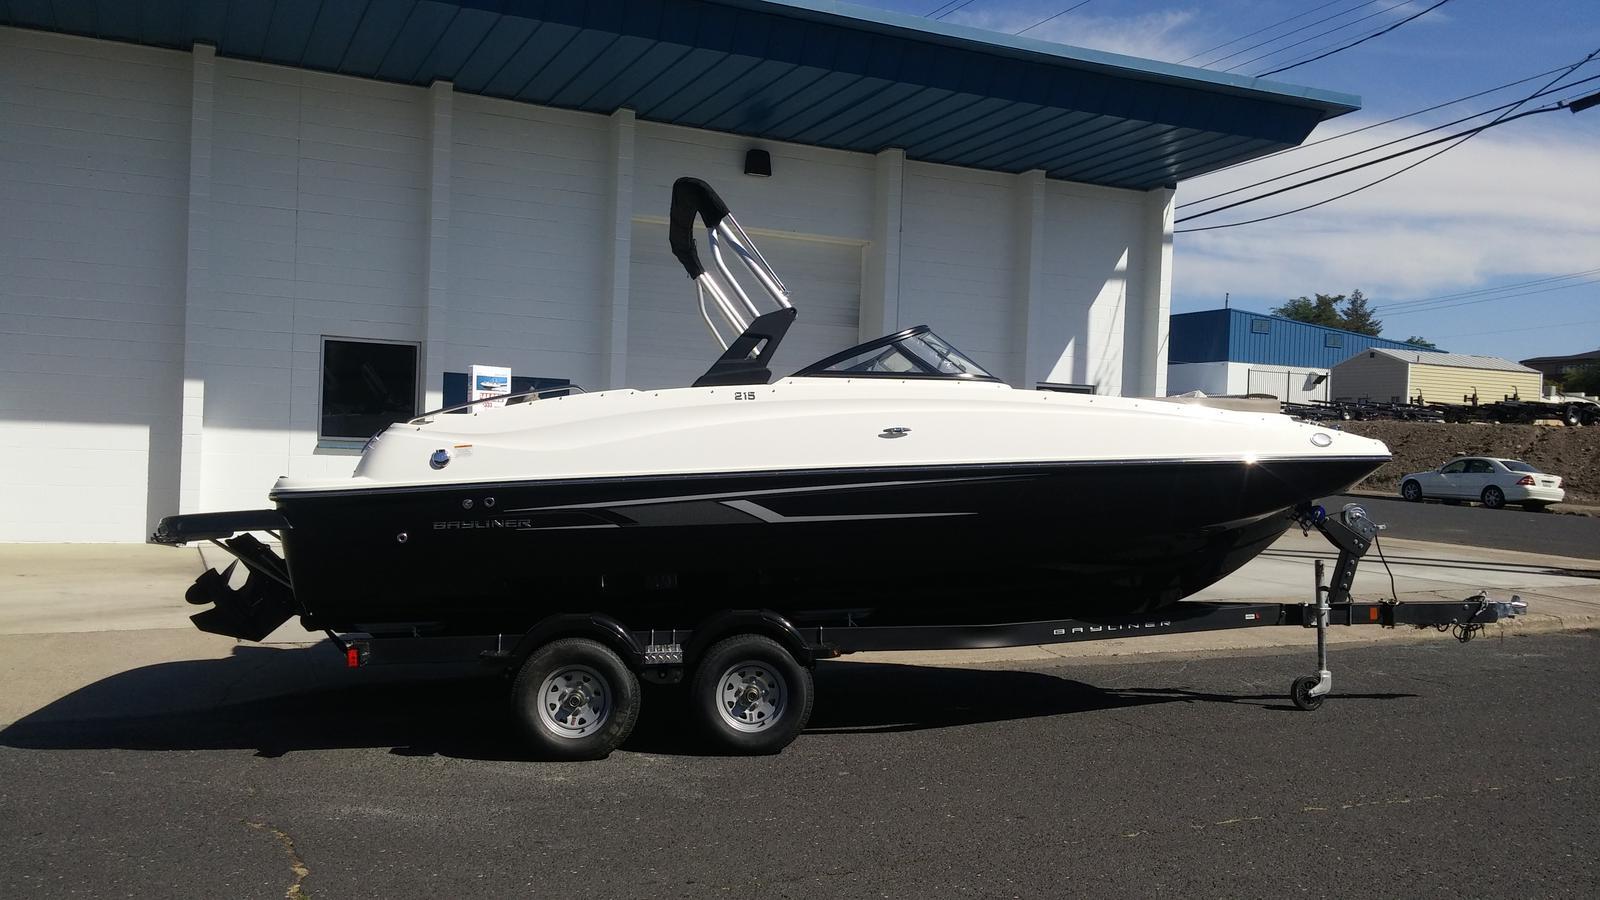 For Sale: 2019 Bayliner 215 Deck Boat 22ft<br/>Trudeau's Sea Ray - Spokane